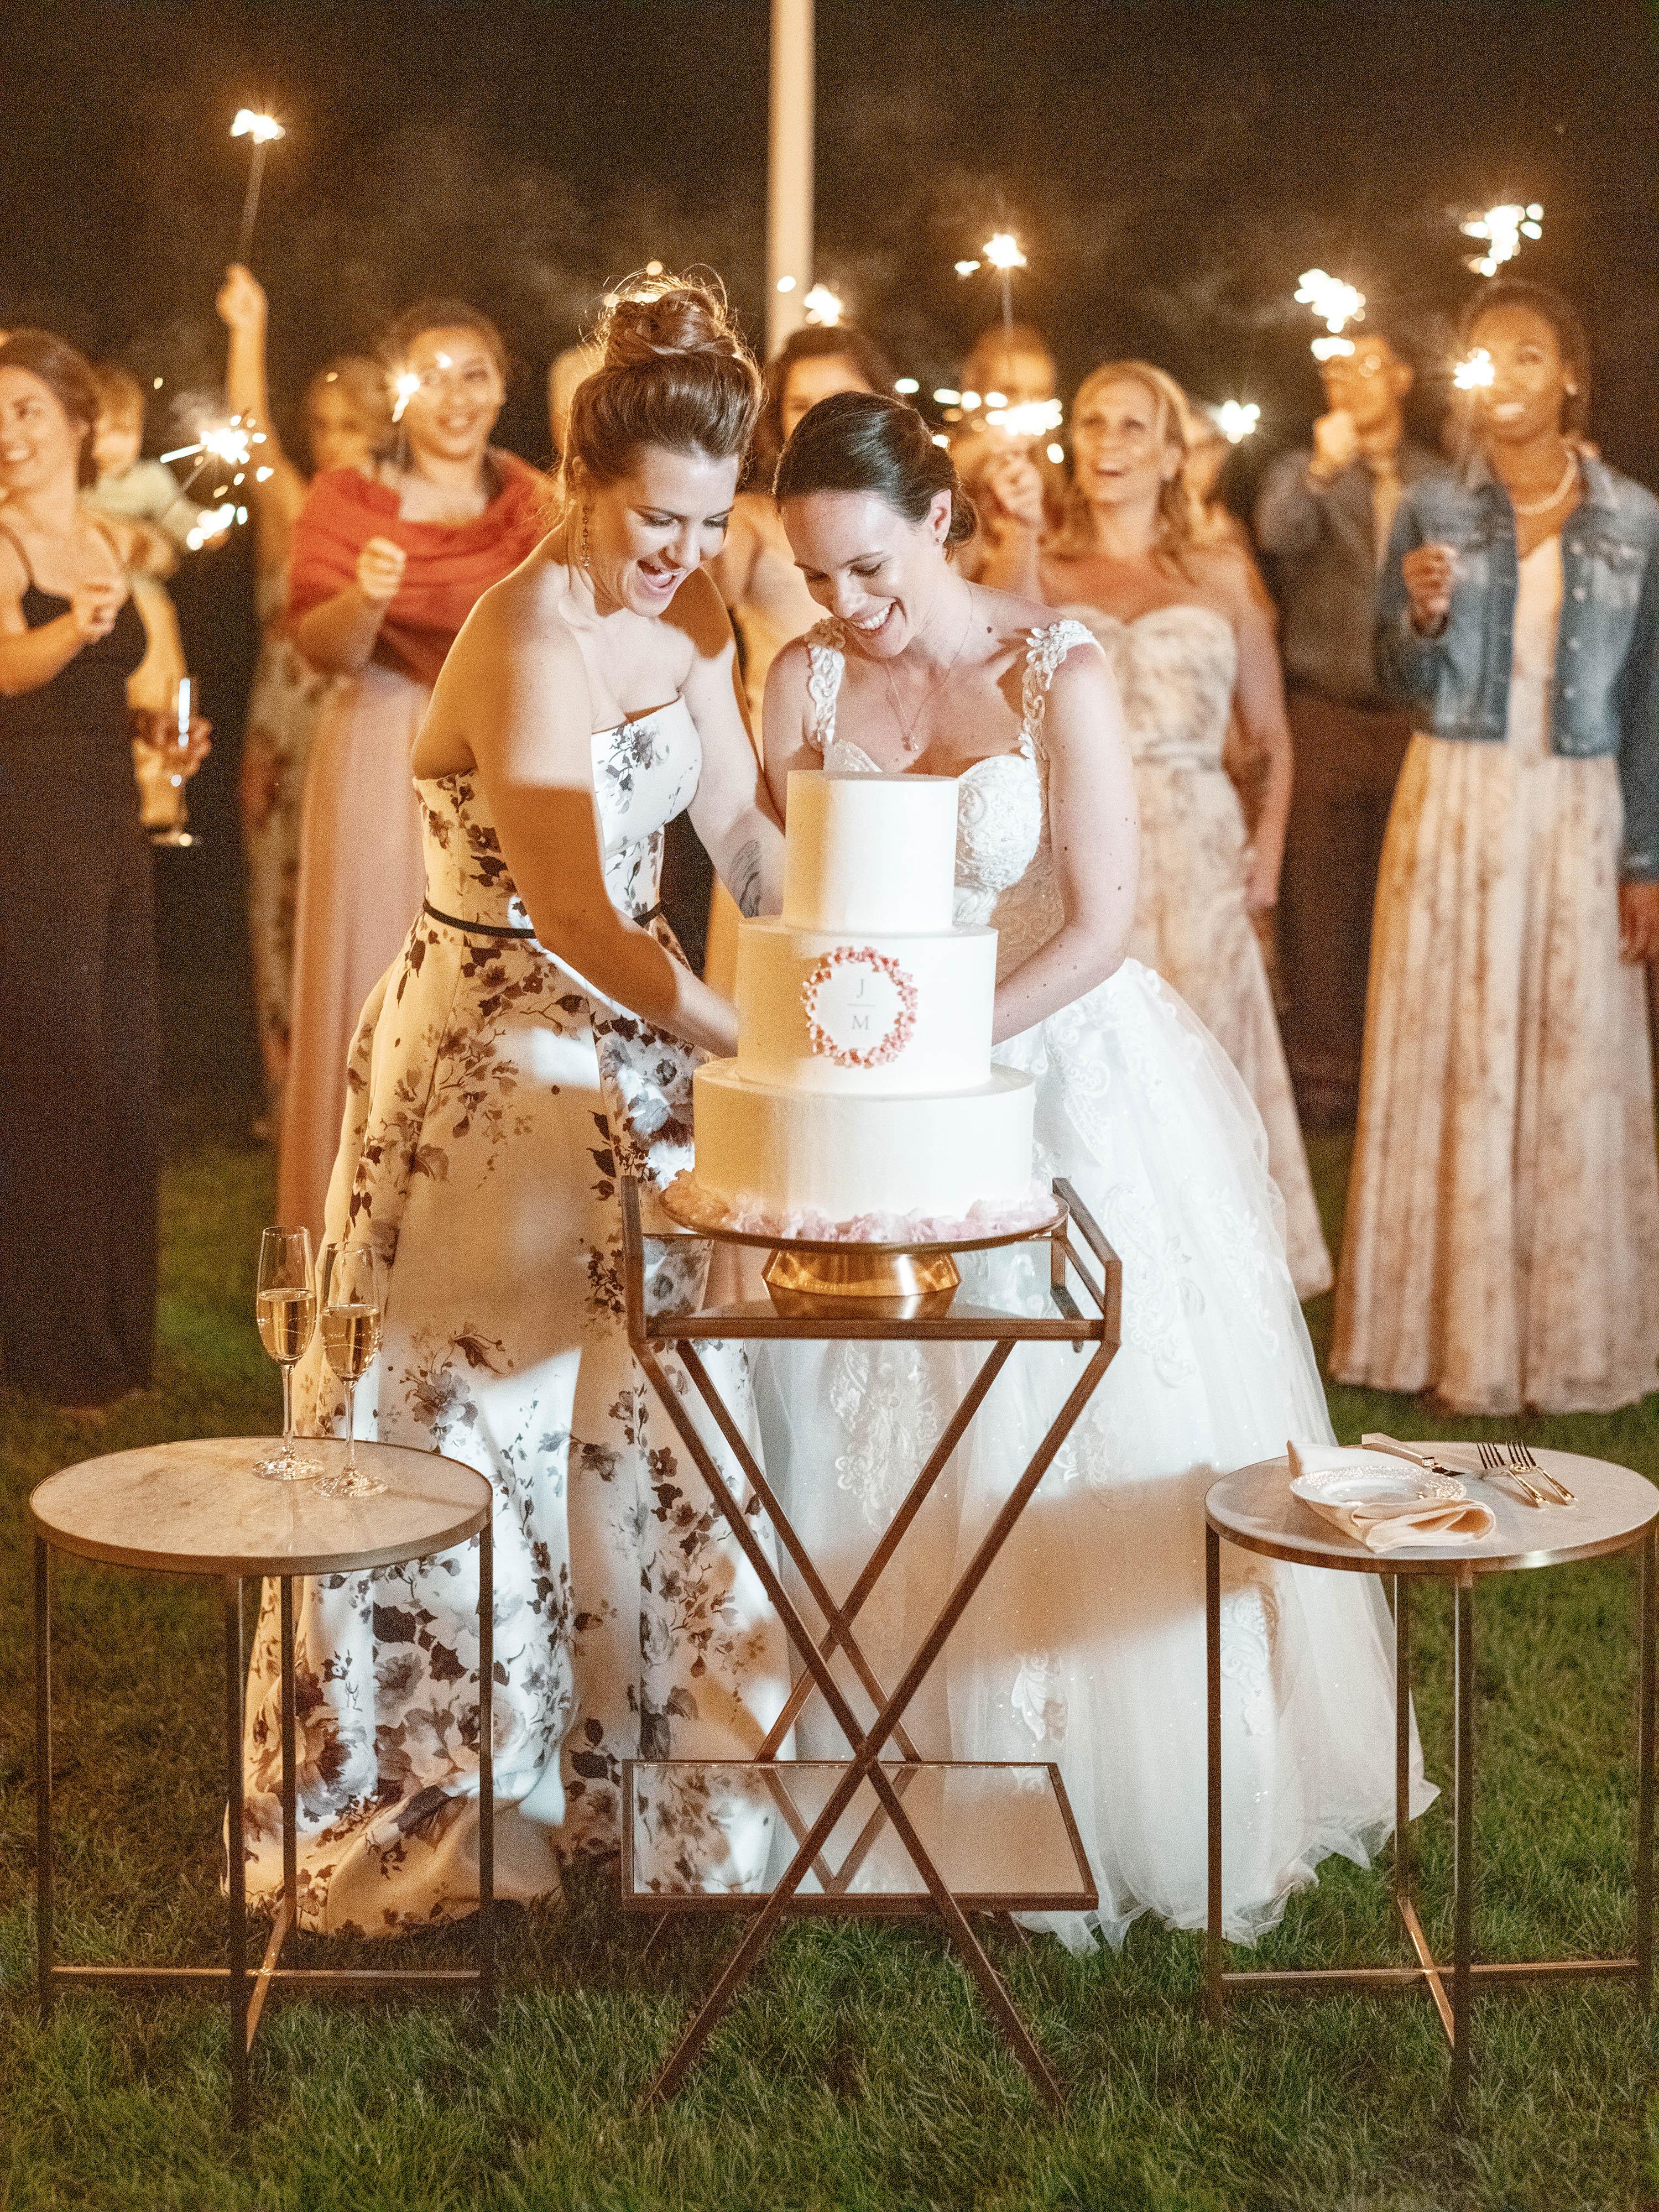 mechelle julia wedding cake cutting couple